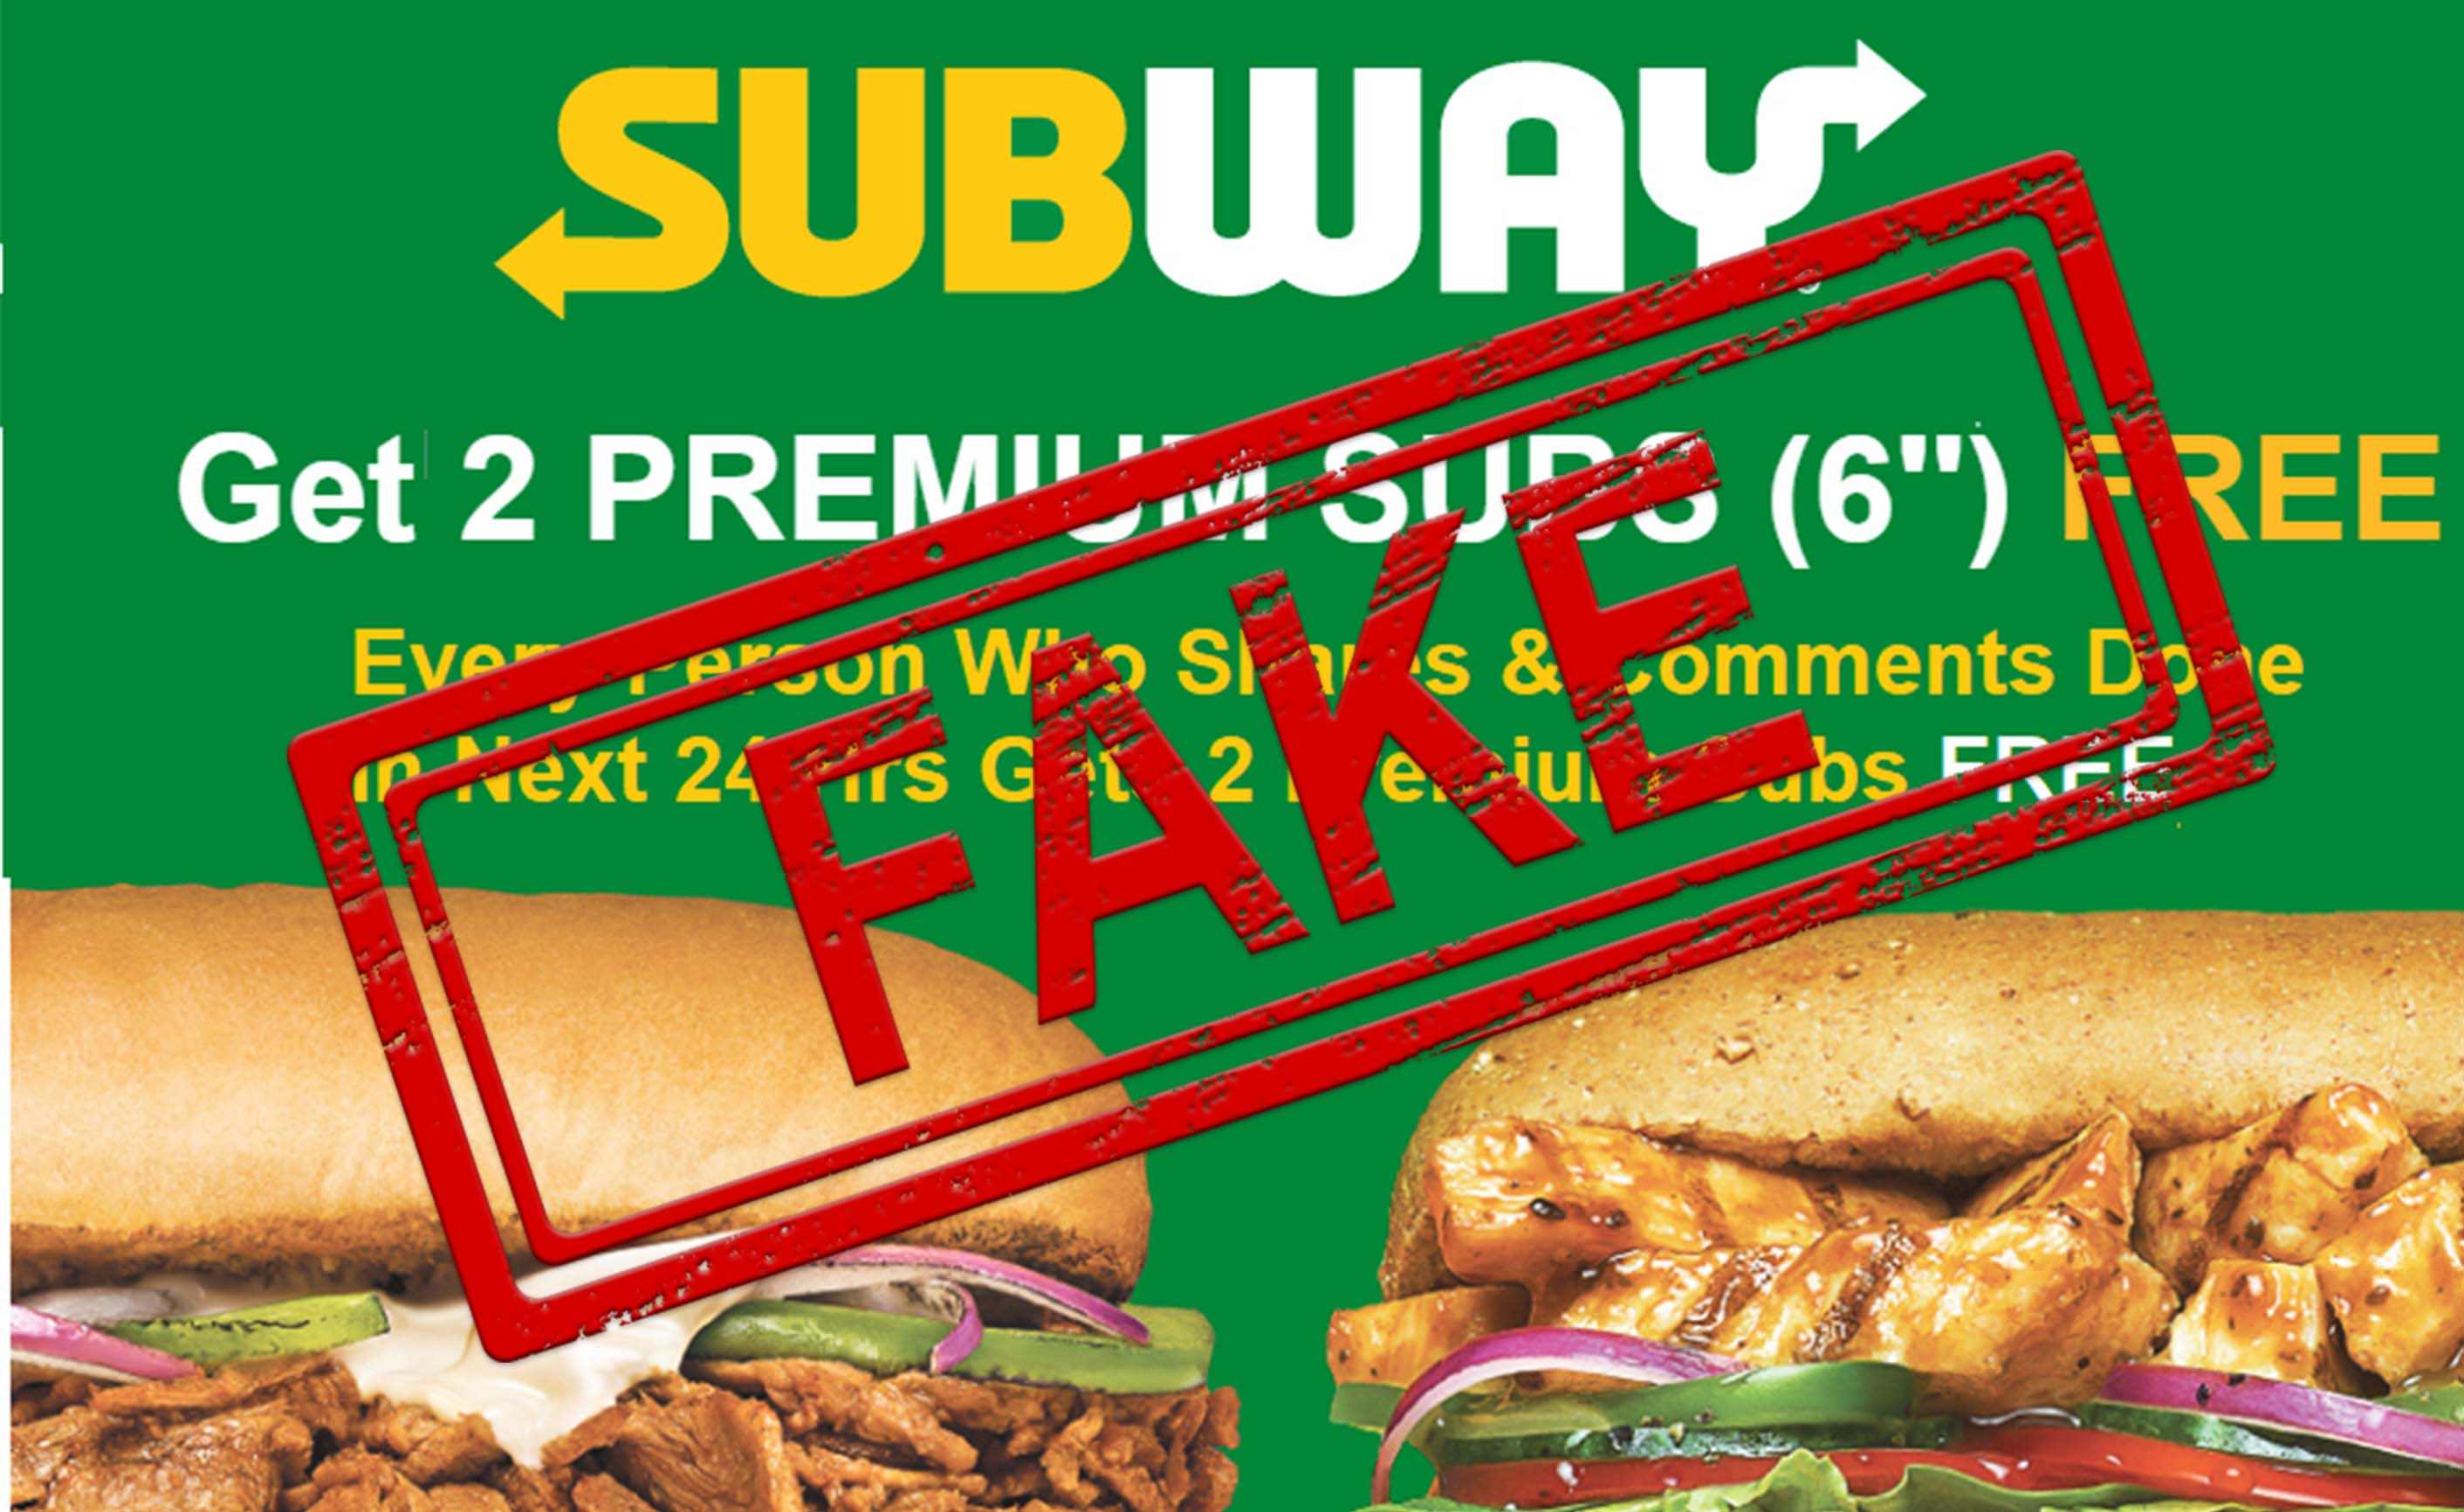 Subway, FAKE, Sub, Free, 2, NewsMobile, Mobile, News, India, FactCheck, Fact Checker